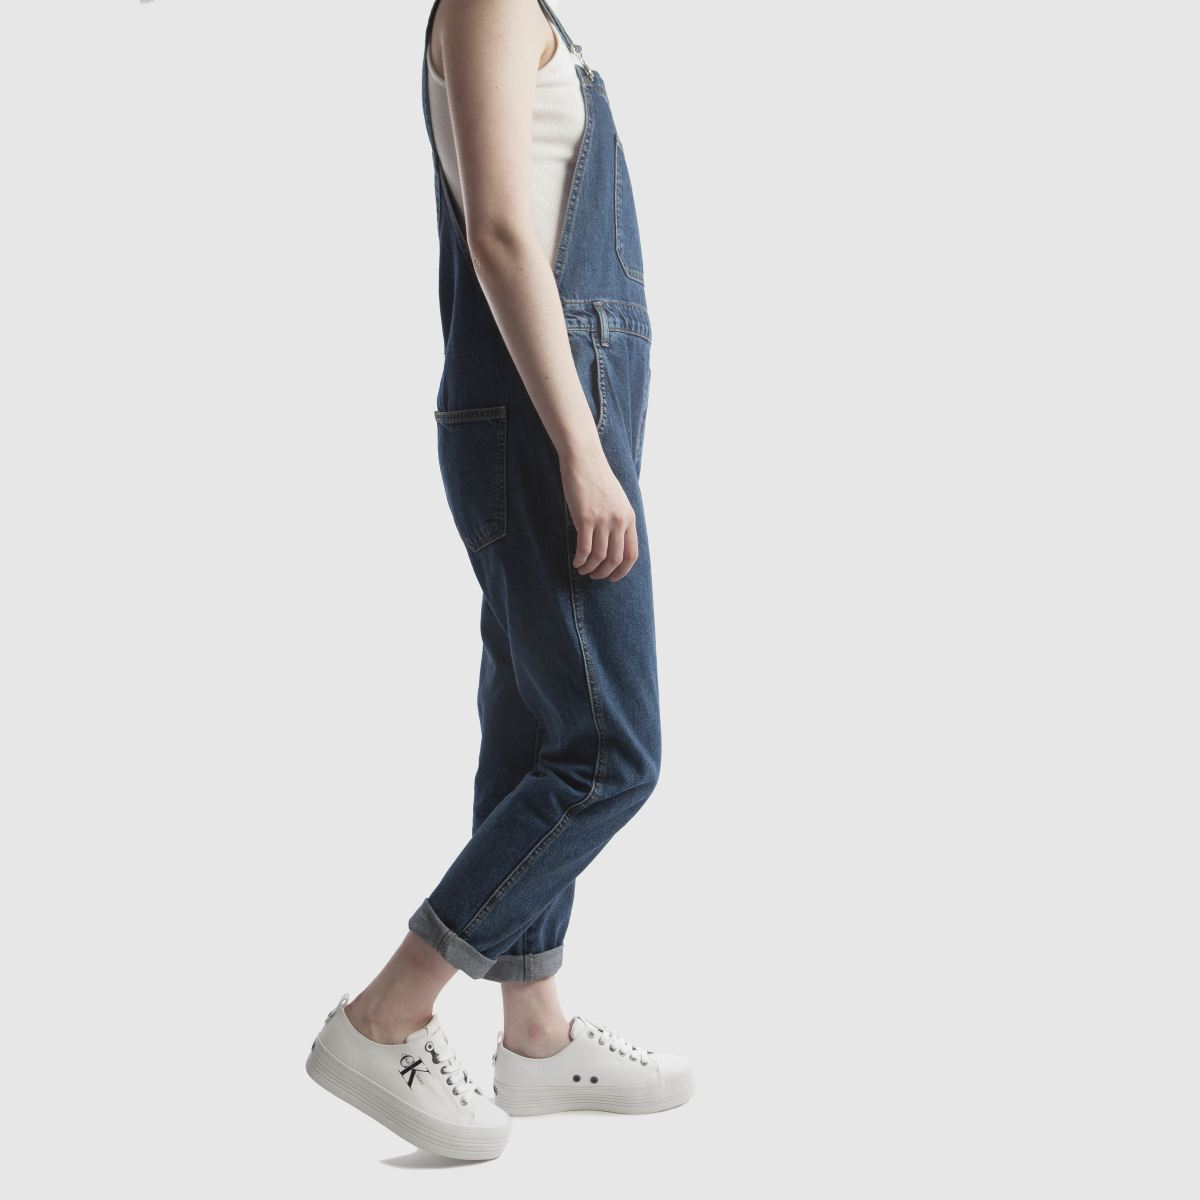 Damen Weiß-schwarz calvin klein Jeans Zolah Canvas Sneaker   Schuhe schuh Gute Qualität beliebte Schuhe   75f420